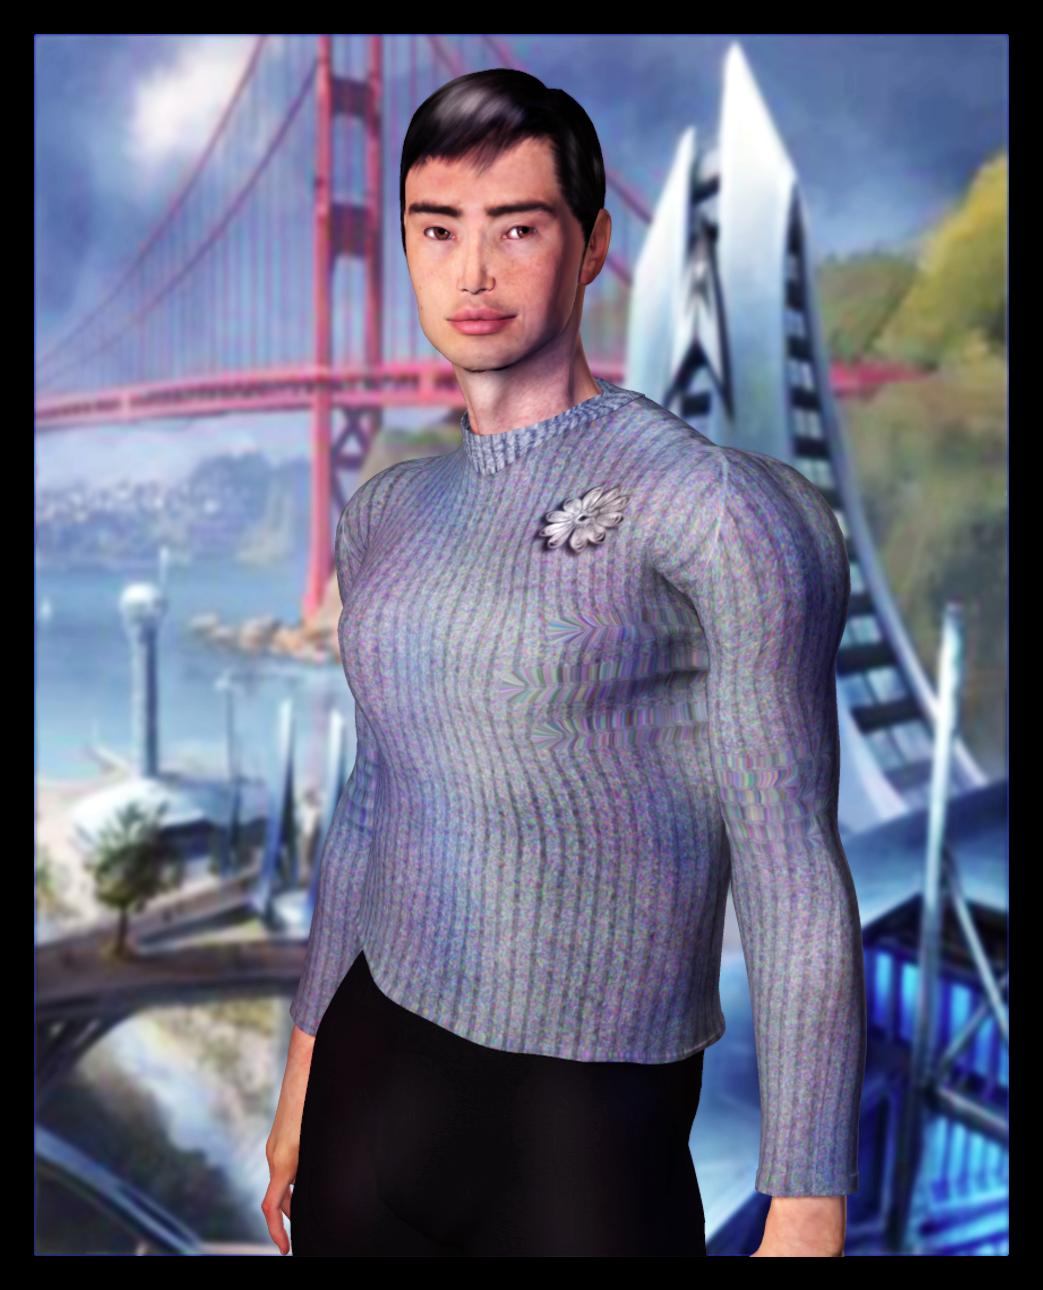 Cadet Sulu Portrait by mylochka